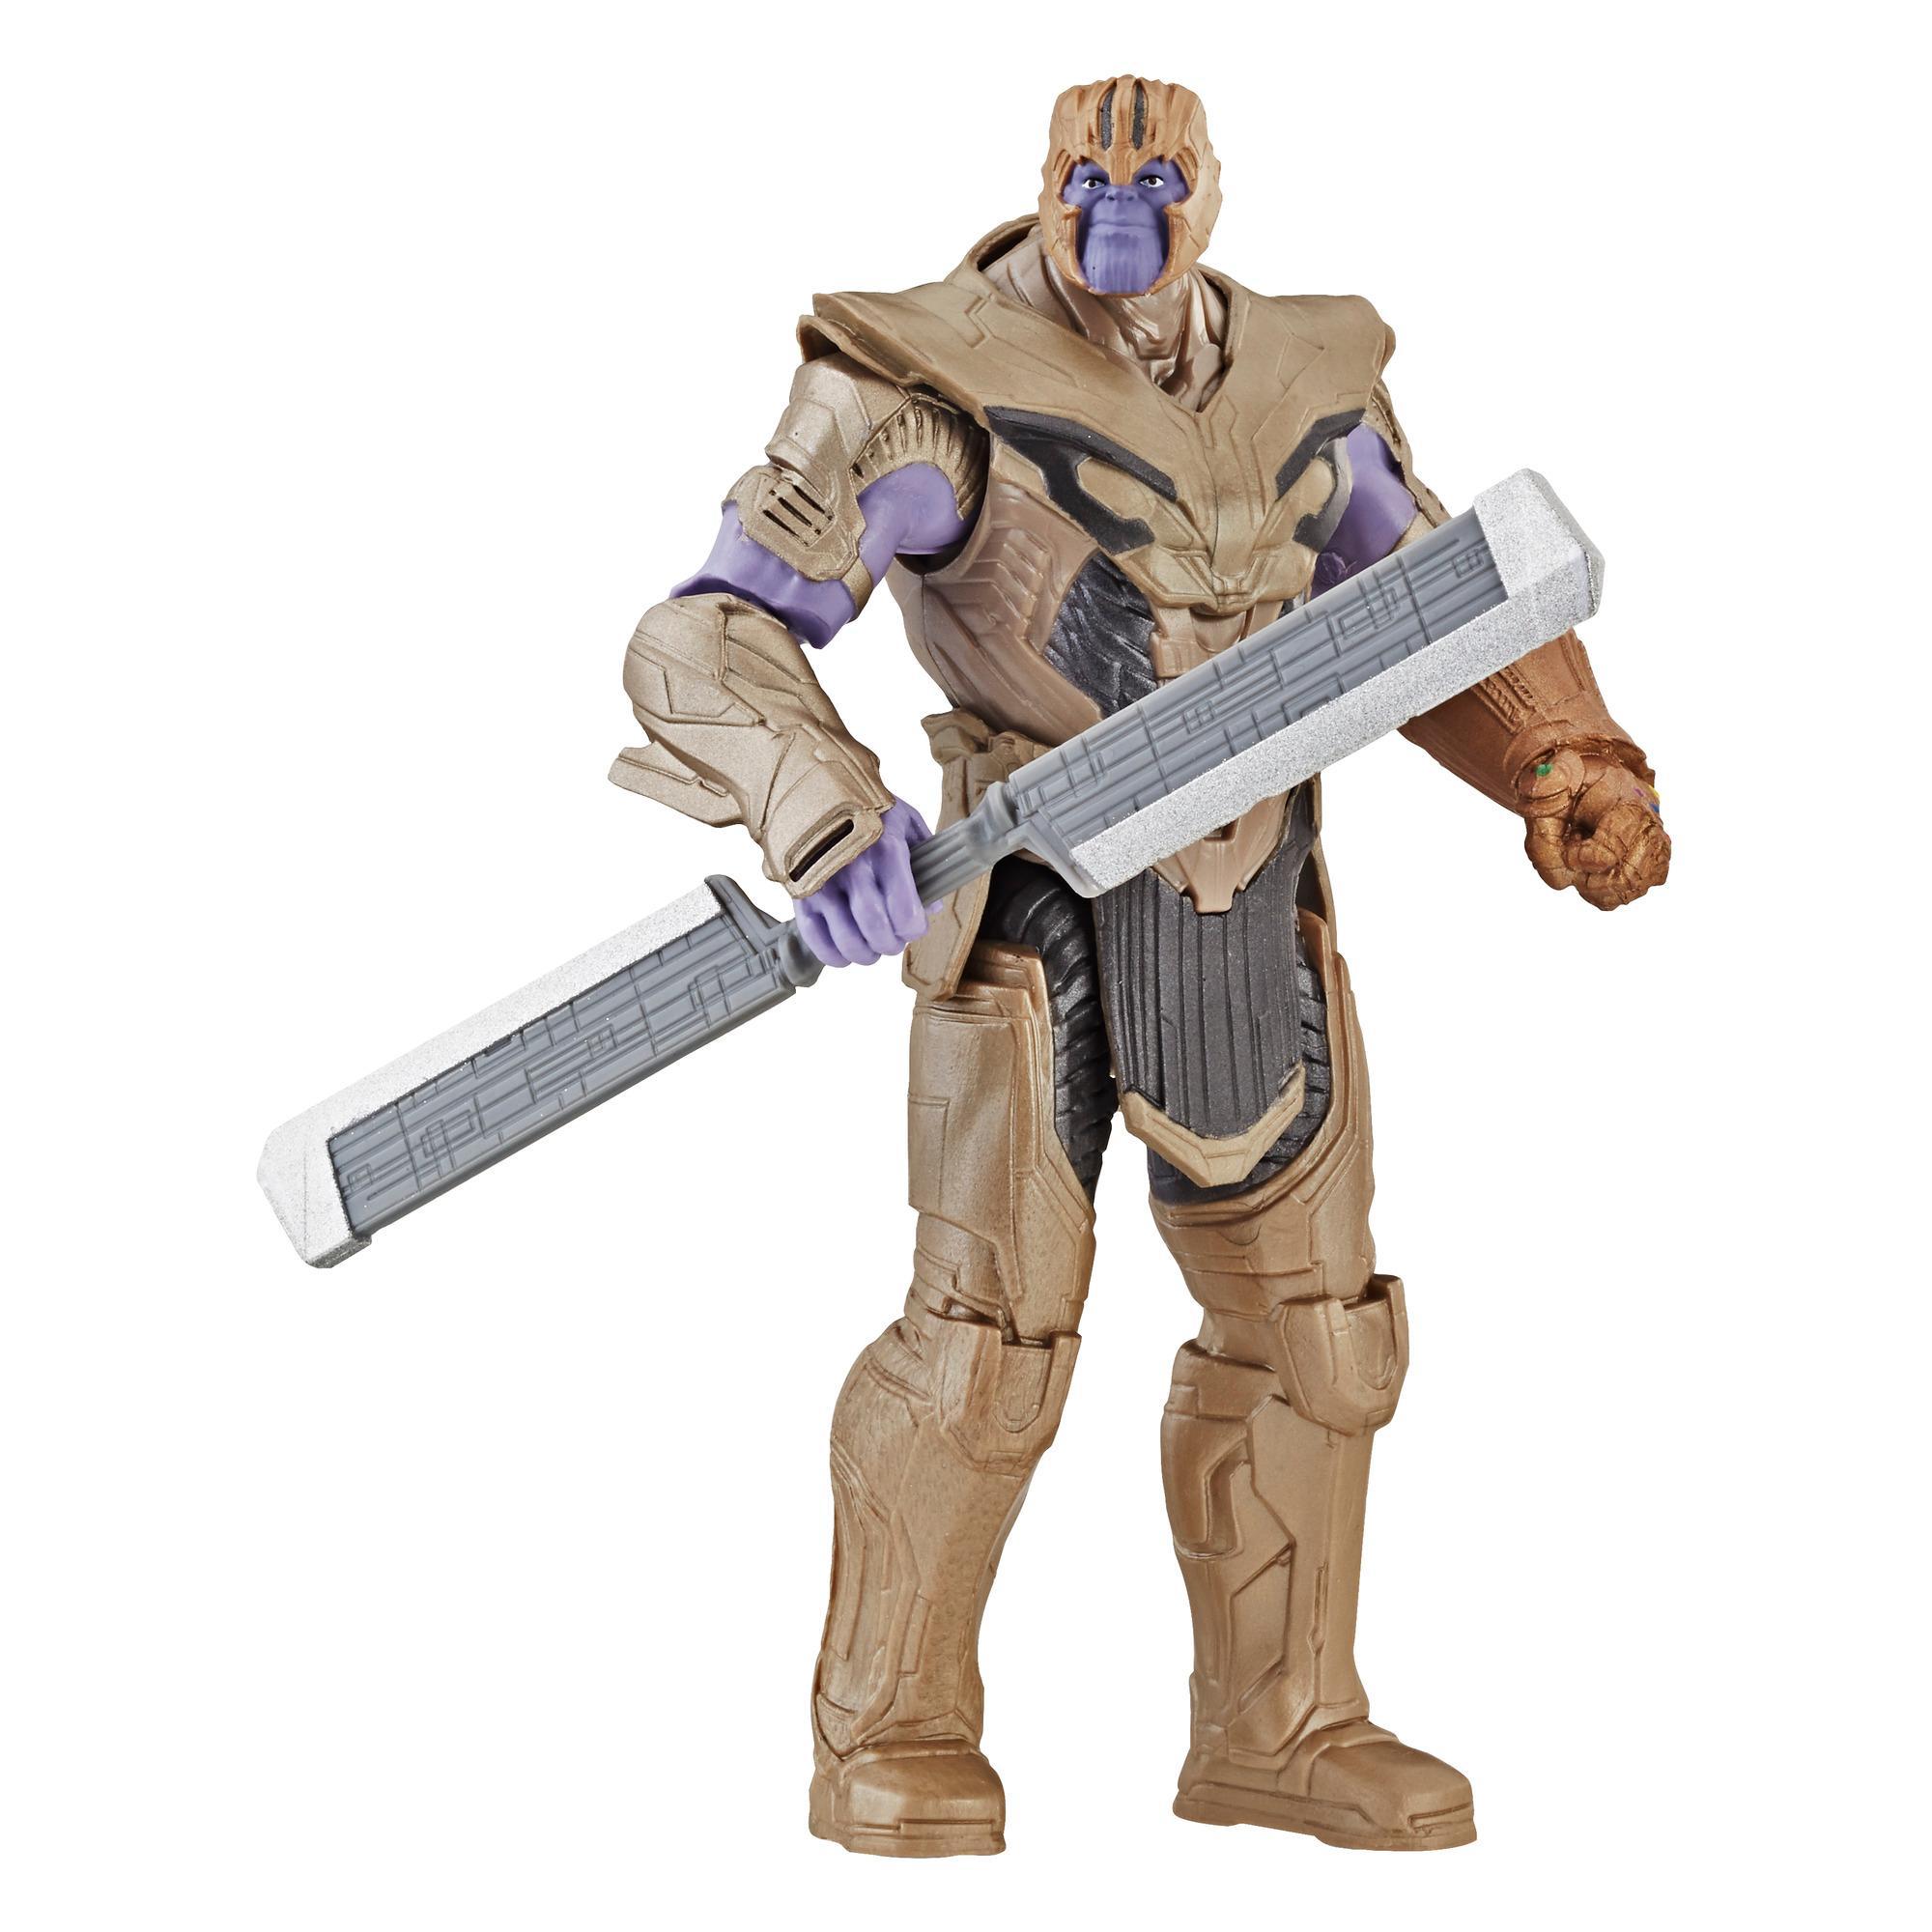 Marvel Avengers: Endgame - Thanos con accessorio(Action Figure, 15 cm)